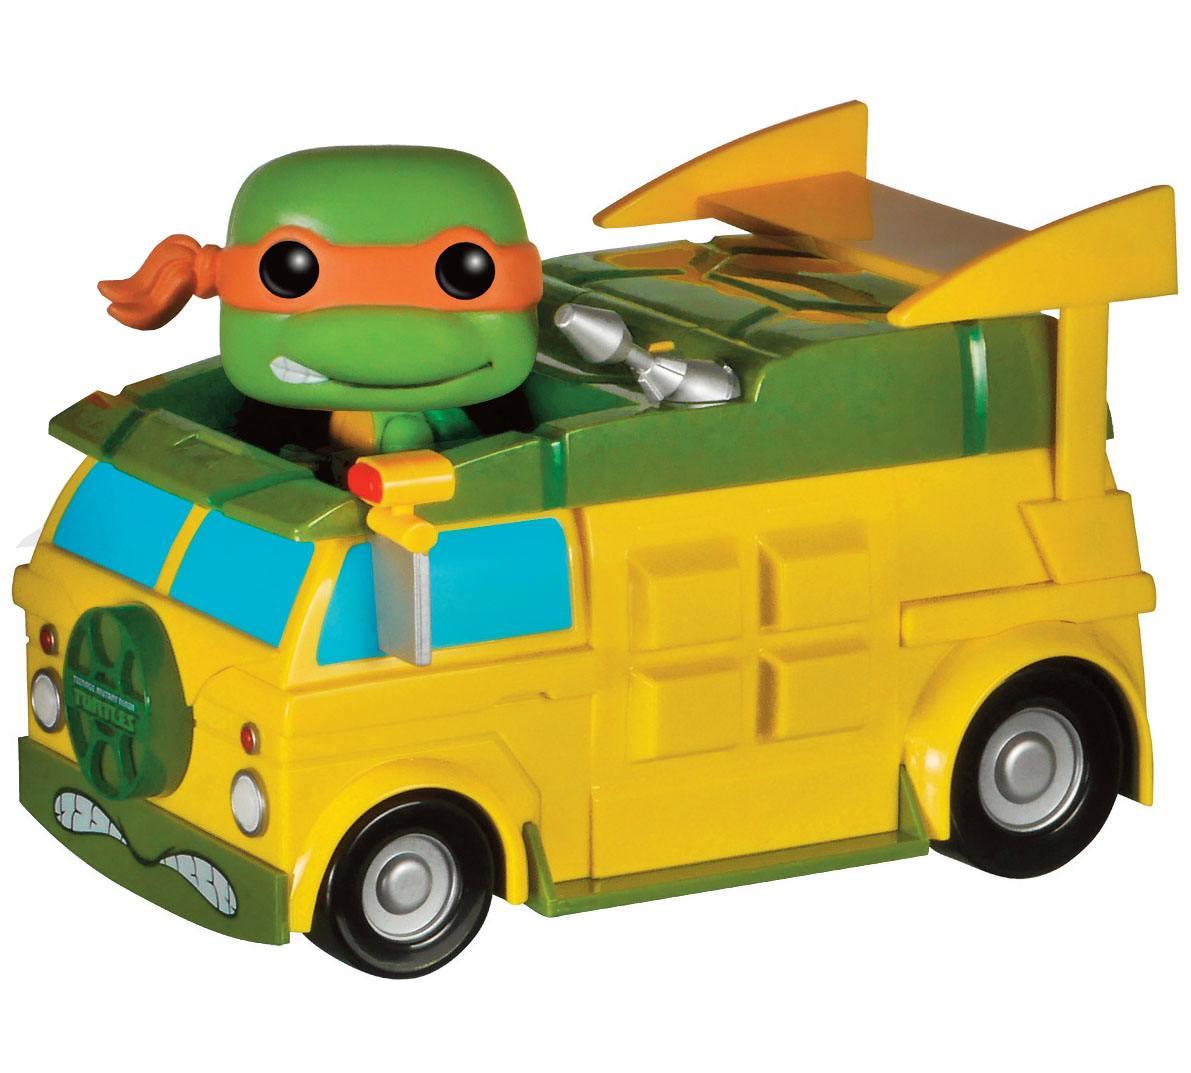 Teenage Mutant Ninja Turtles POP! Vinyl Figure Van with Michelangelo 20 cm